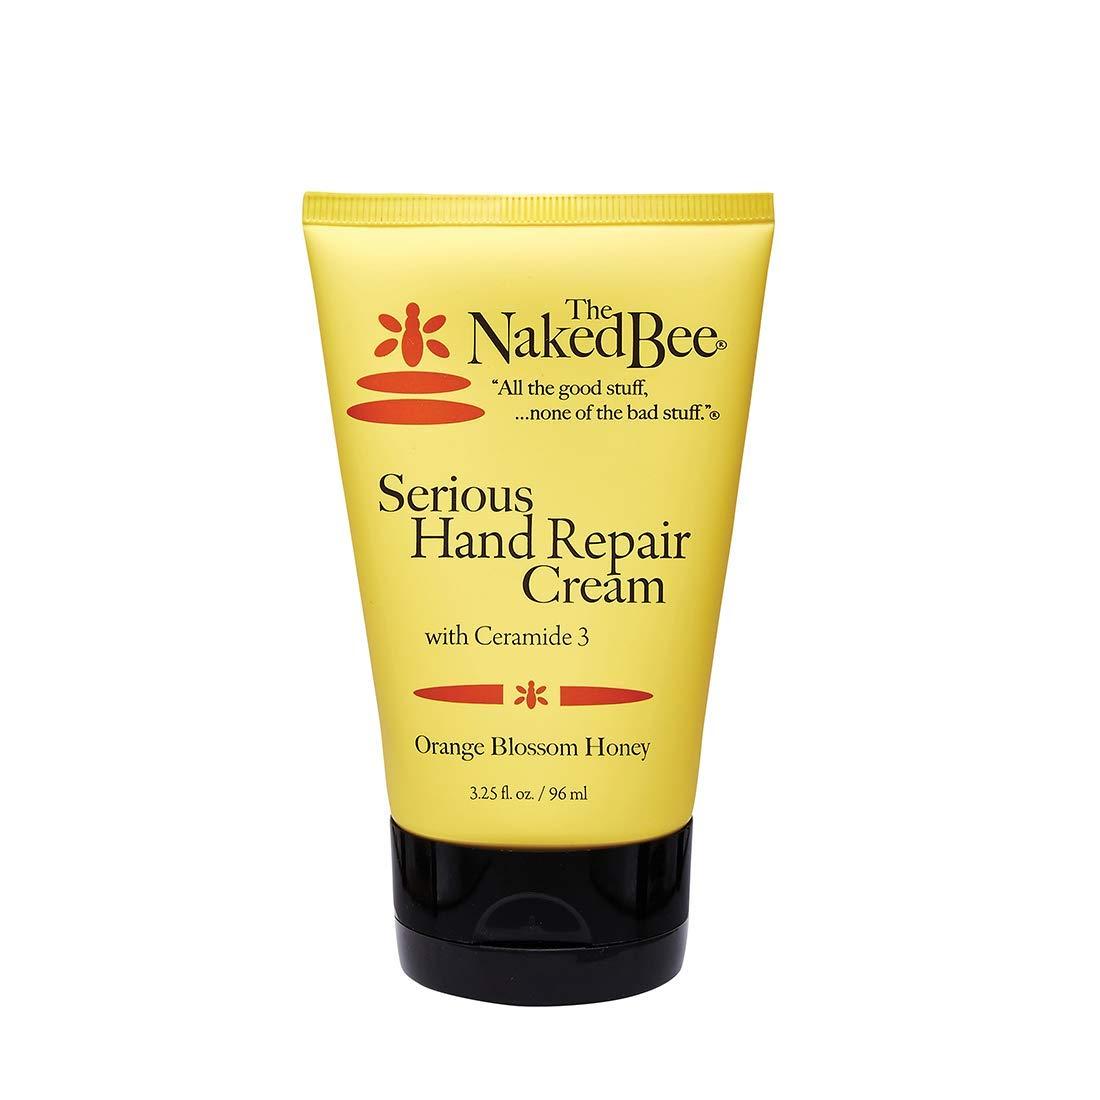 The Naked Bee Orange Blossom Honey Serious Hand Repair Cream, 3.25 Oz : Beauty